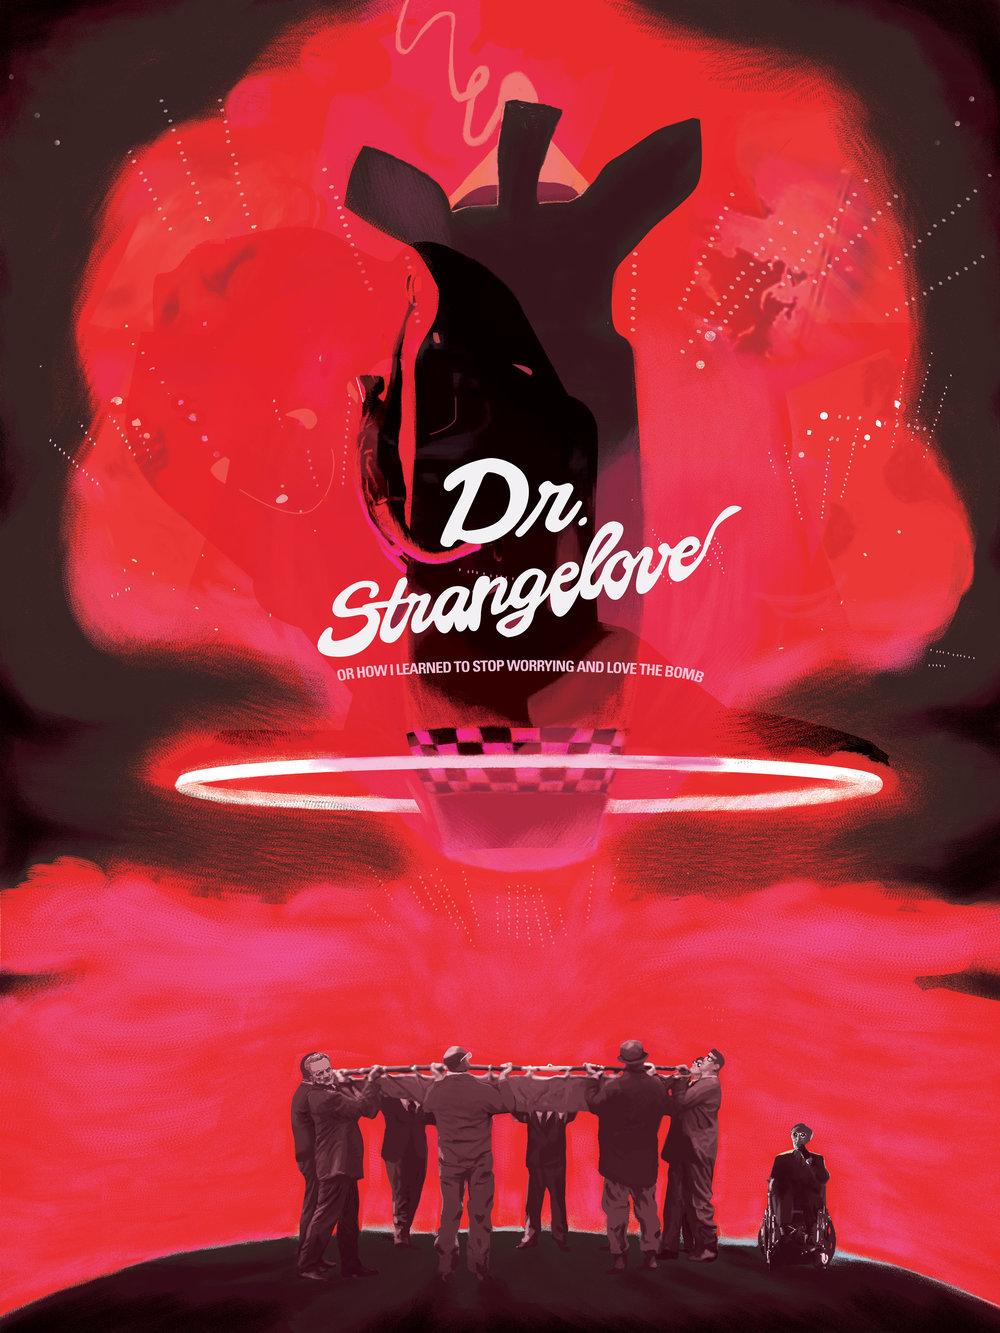 DoctorStrangelovepink(2).jpg